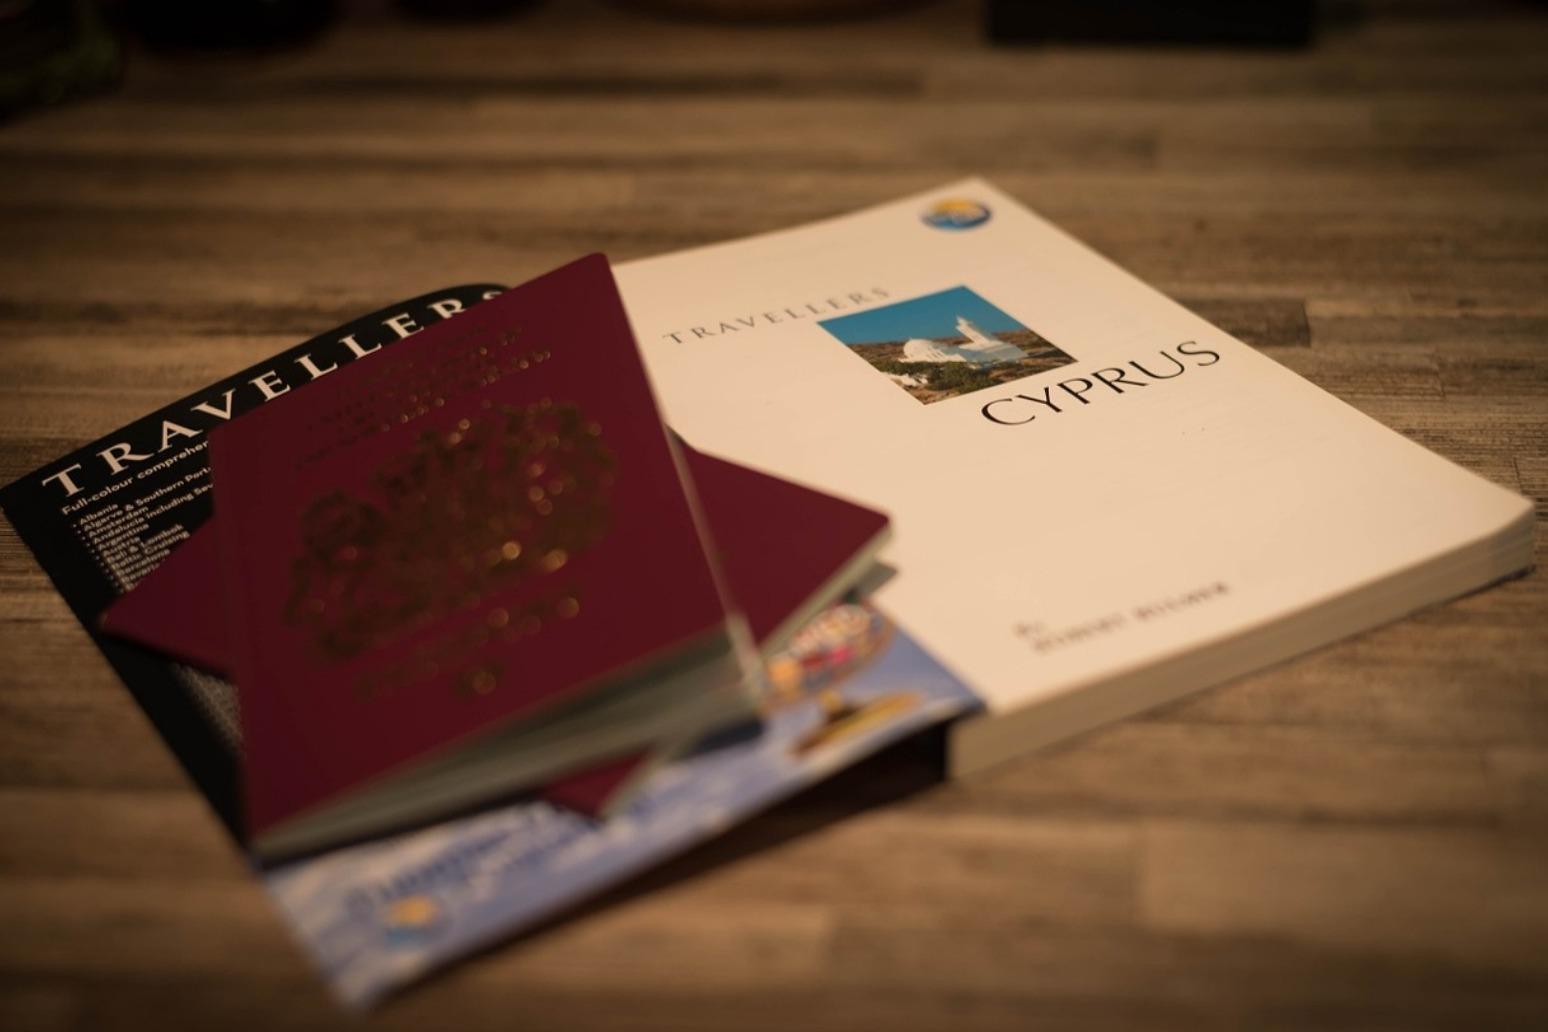 De La Rue will not appeal loss of Passport contract